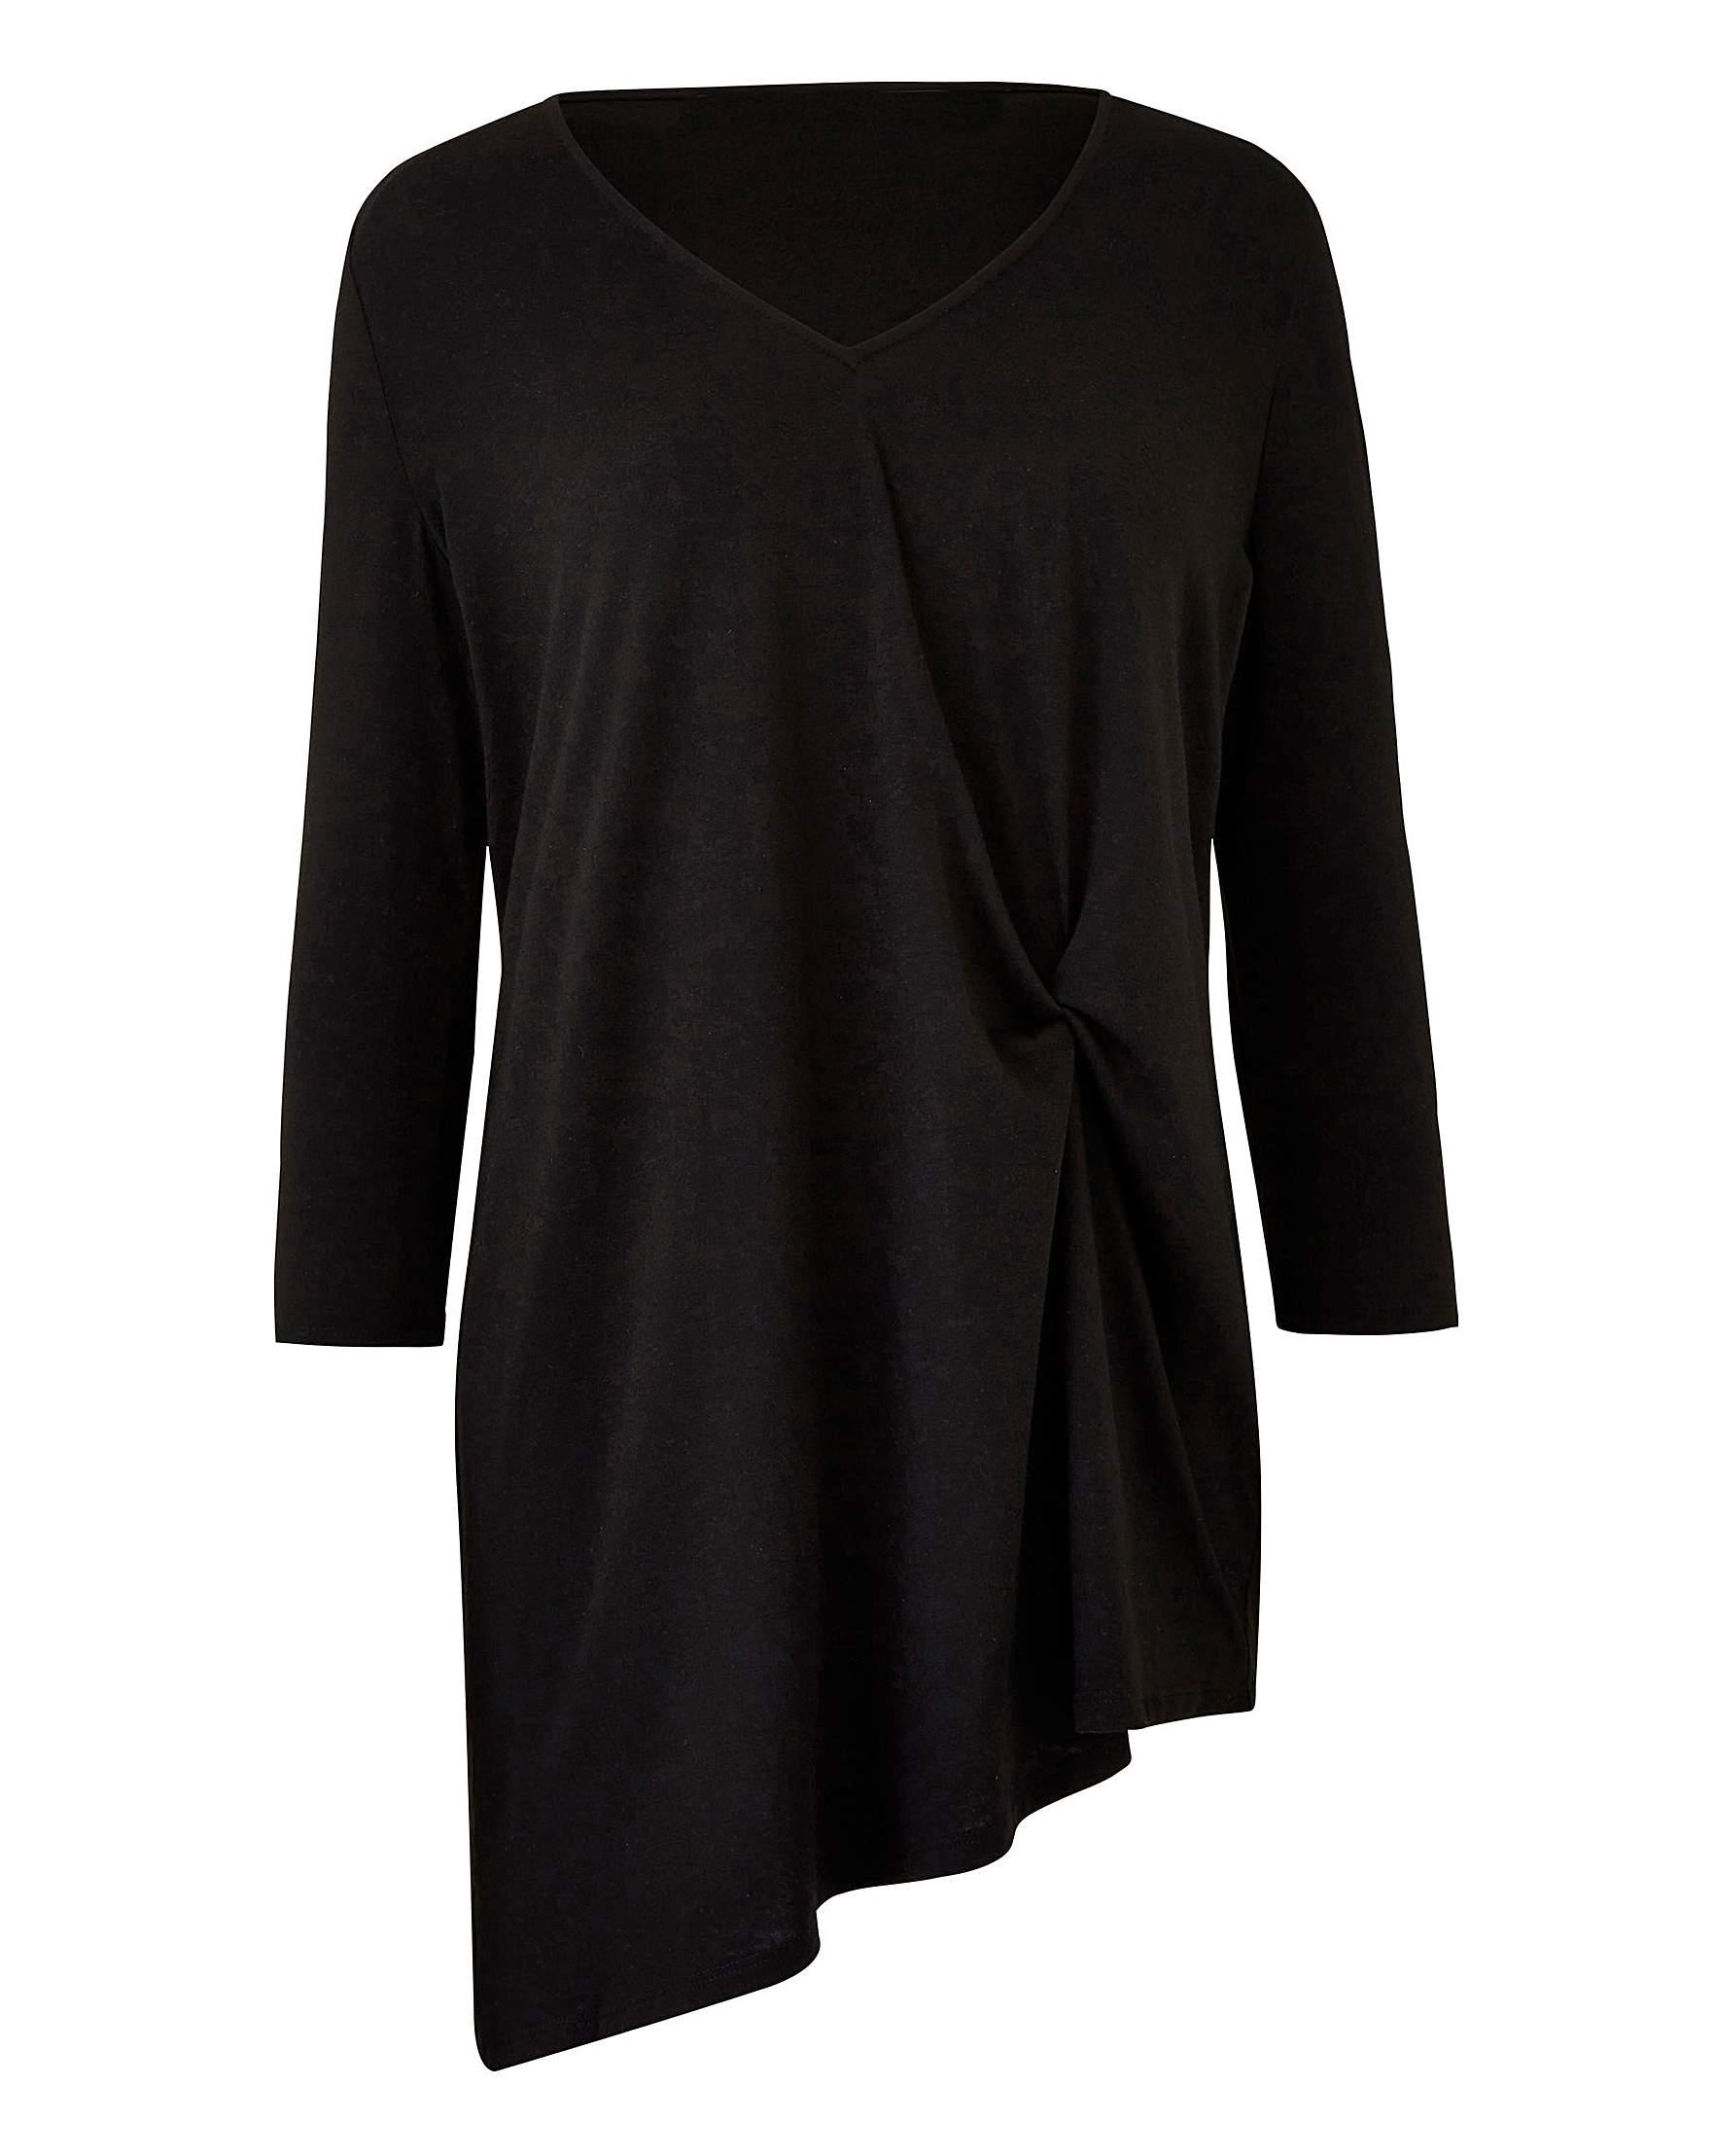 1633fbb5ae4 Black Twist Asymmetric Hem Tunic